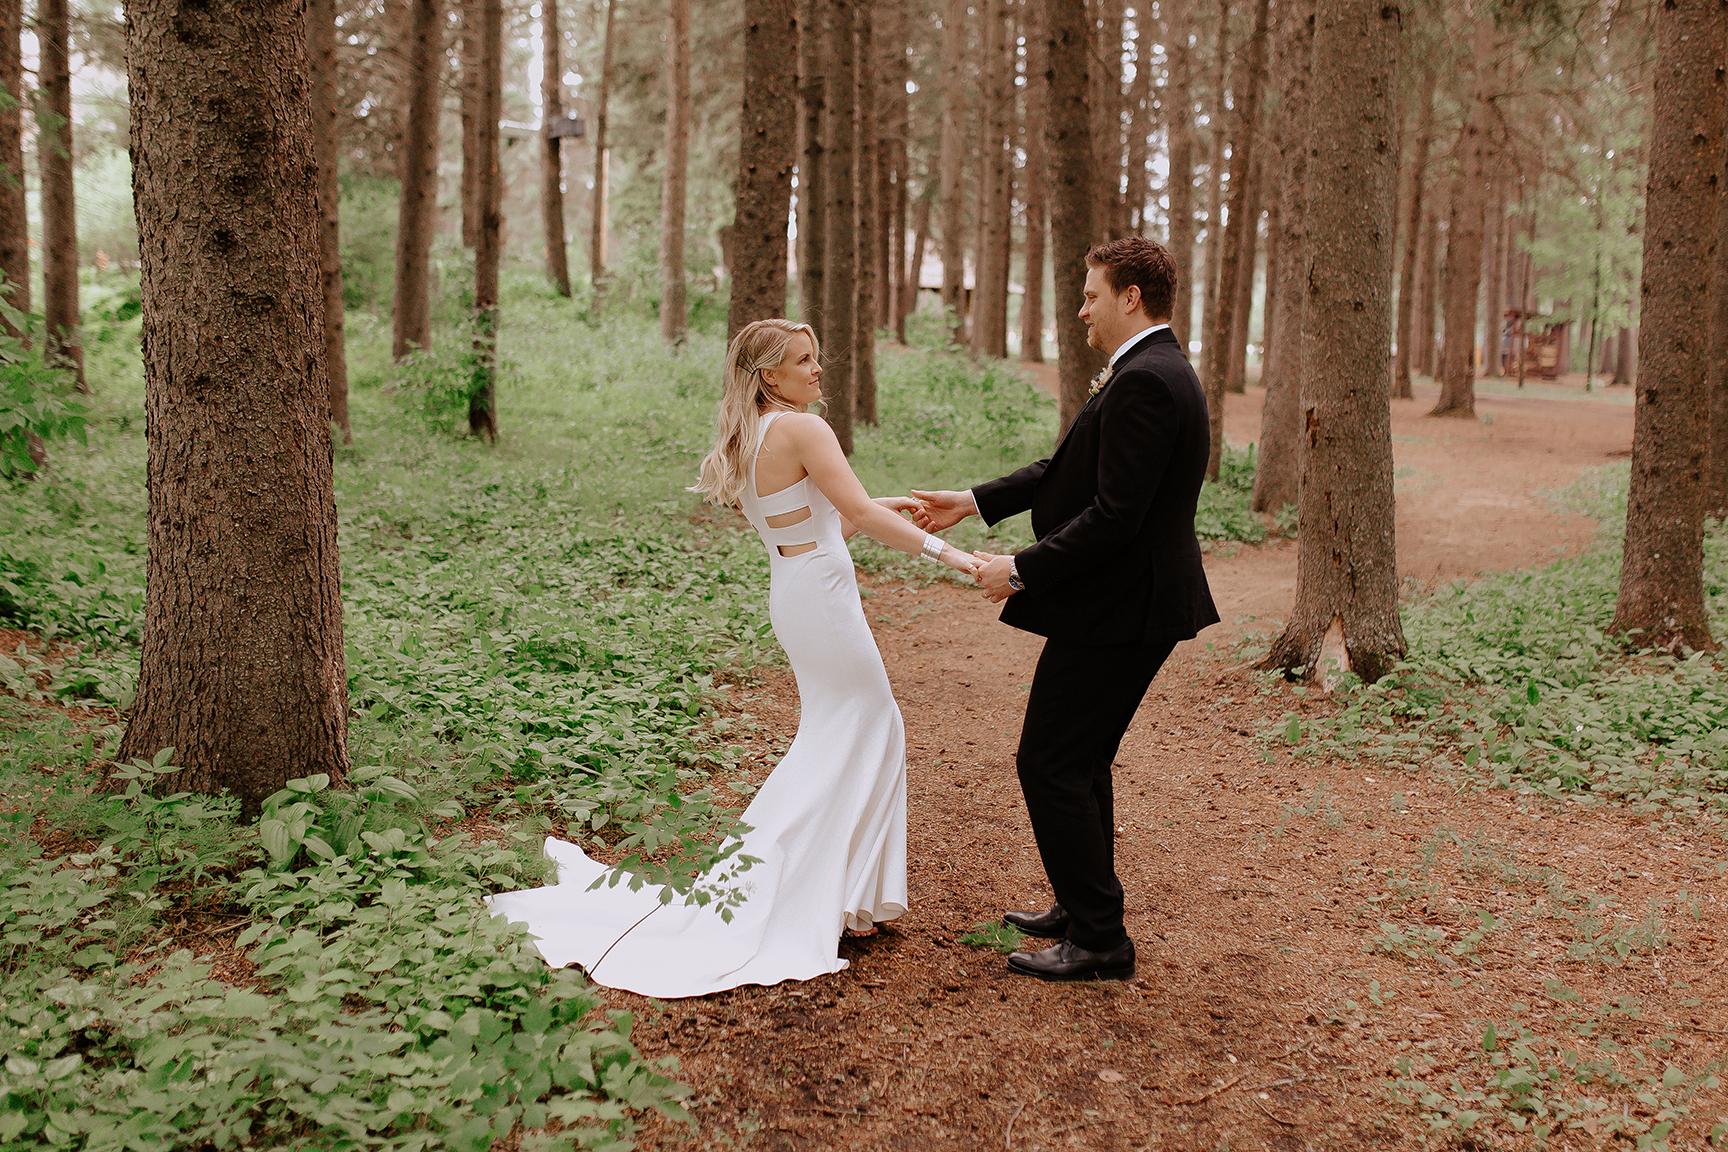 Bridal_Party_195_web.jpg